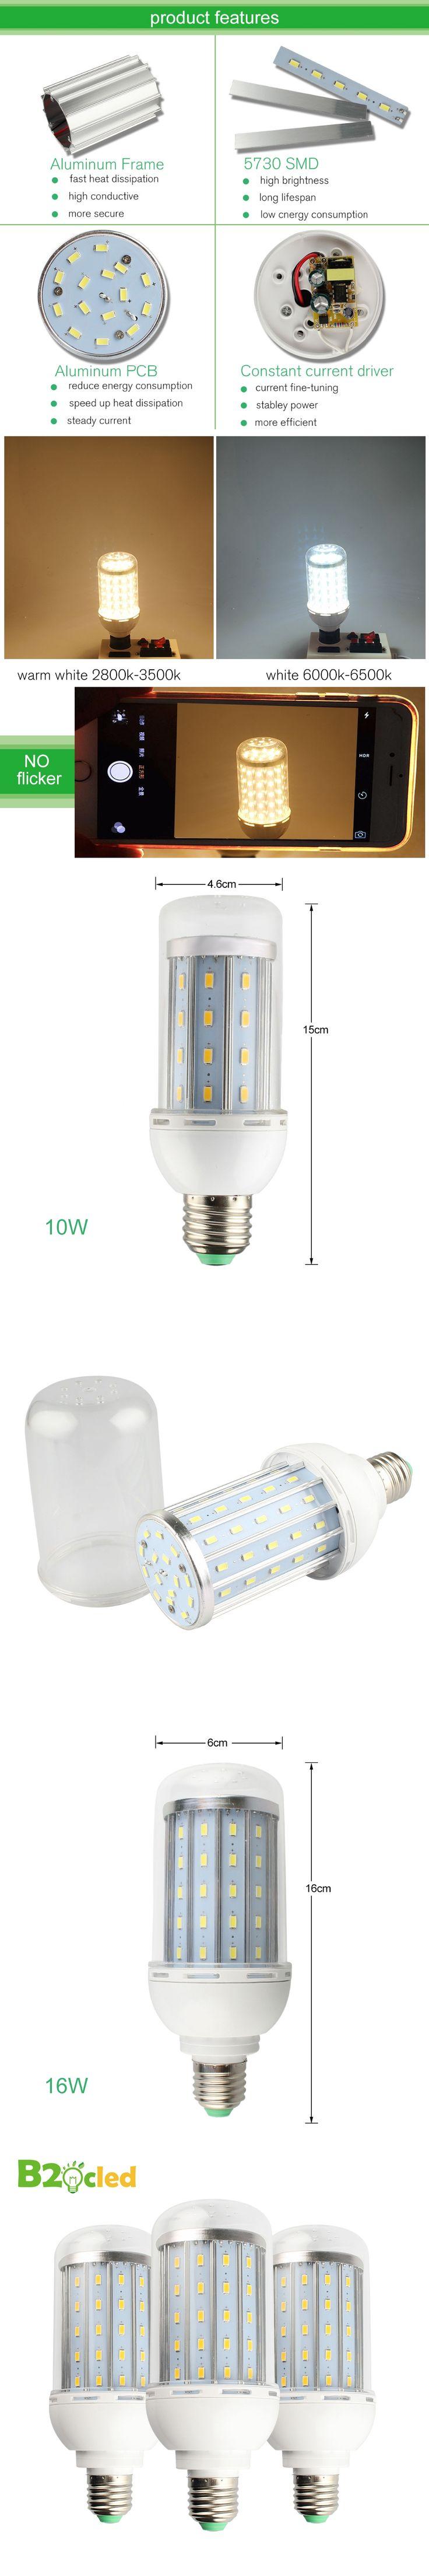 High quality LED bulb corn SMD 5730 110V 220V 85-265V E27 10W 16W corn lamp With cover led bulb ball warm white led spot light